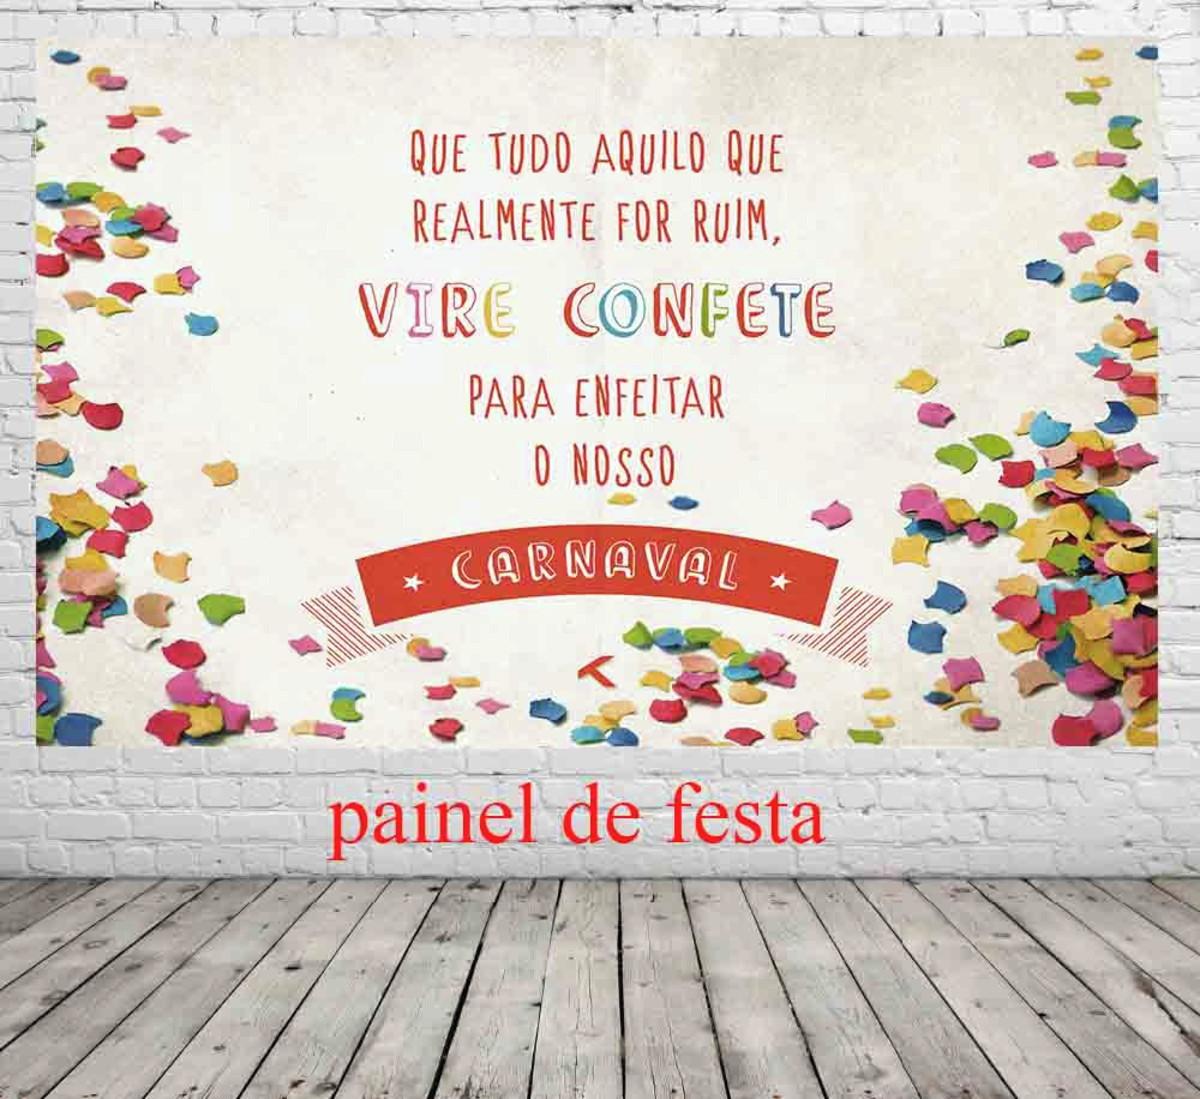 Painel De Festa Com Frase De Carnaval